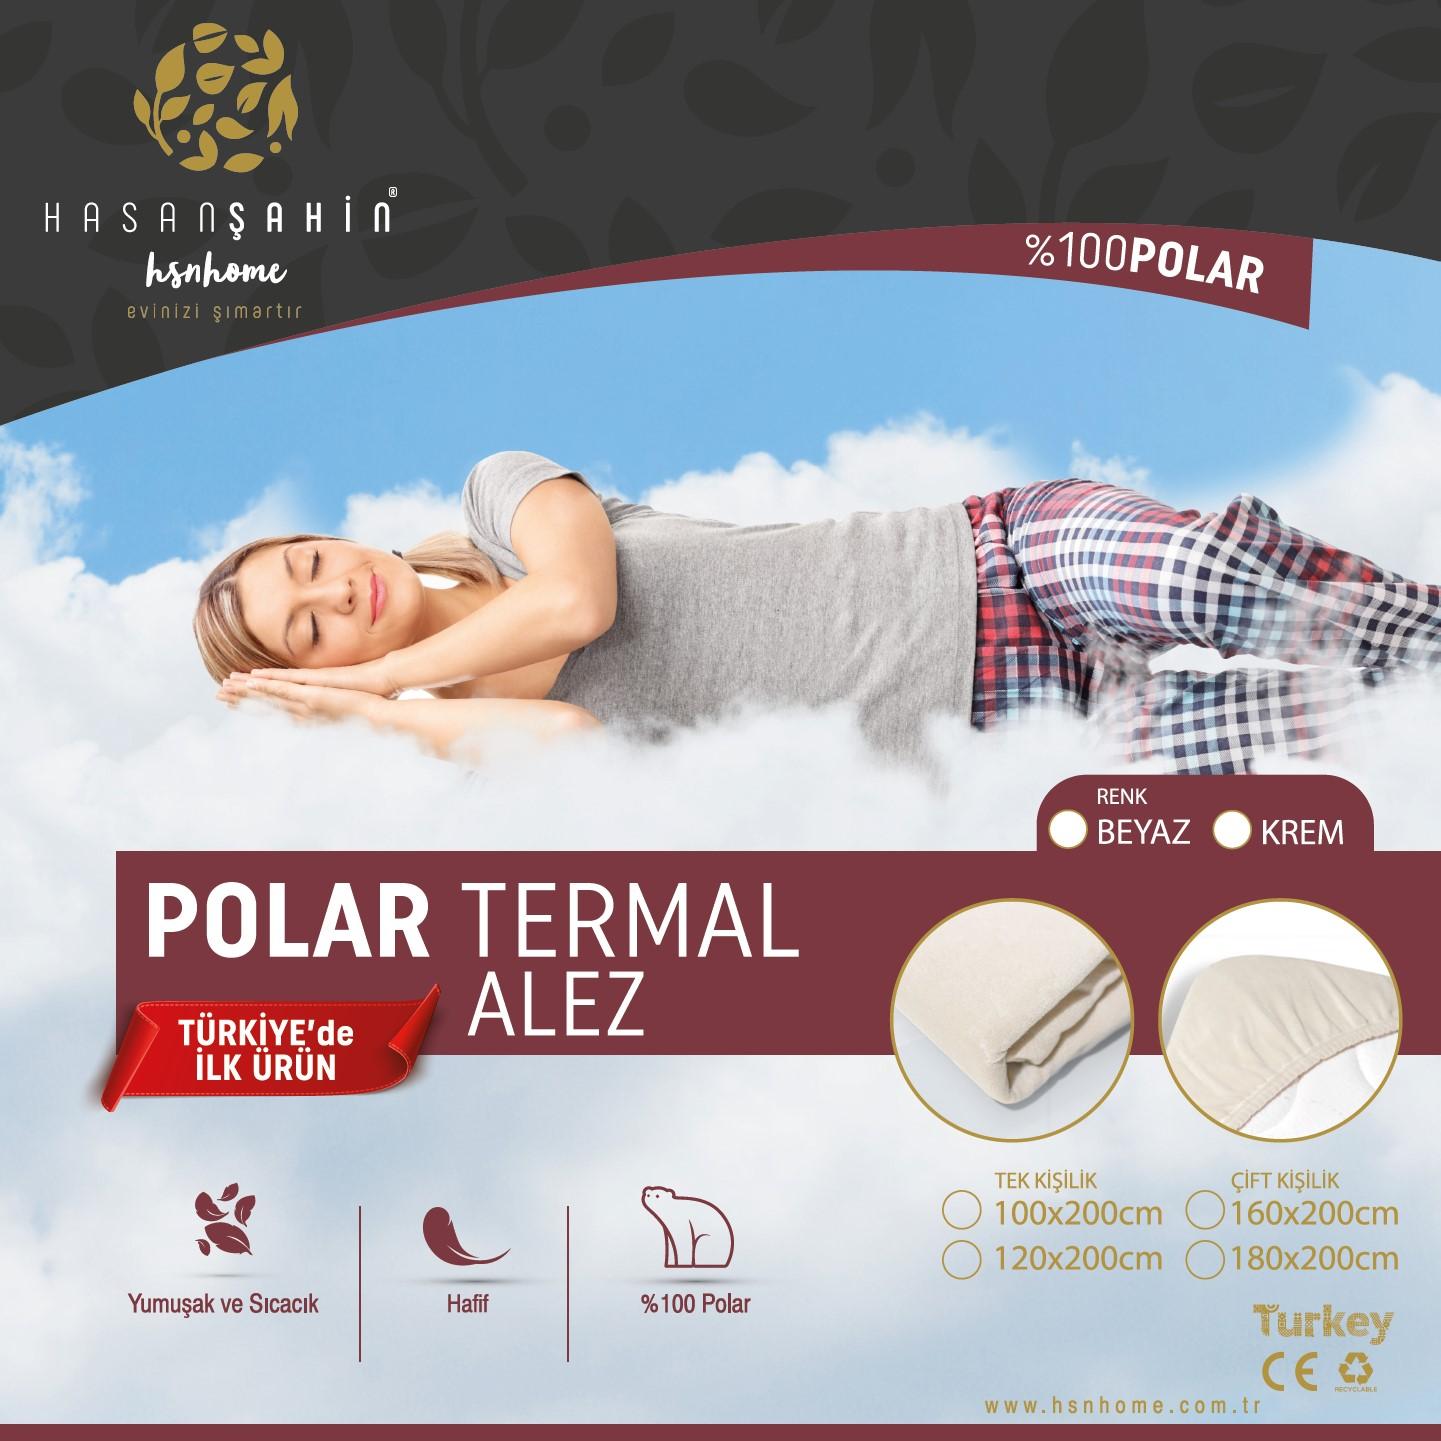 Polar Termal Alez 100 x 200cm